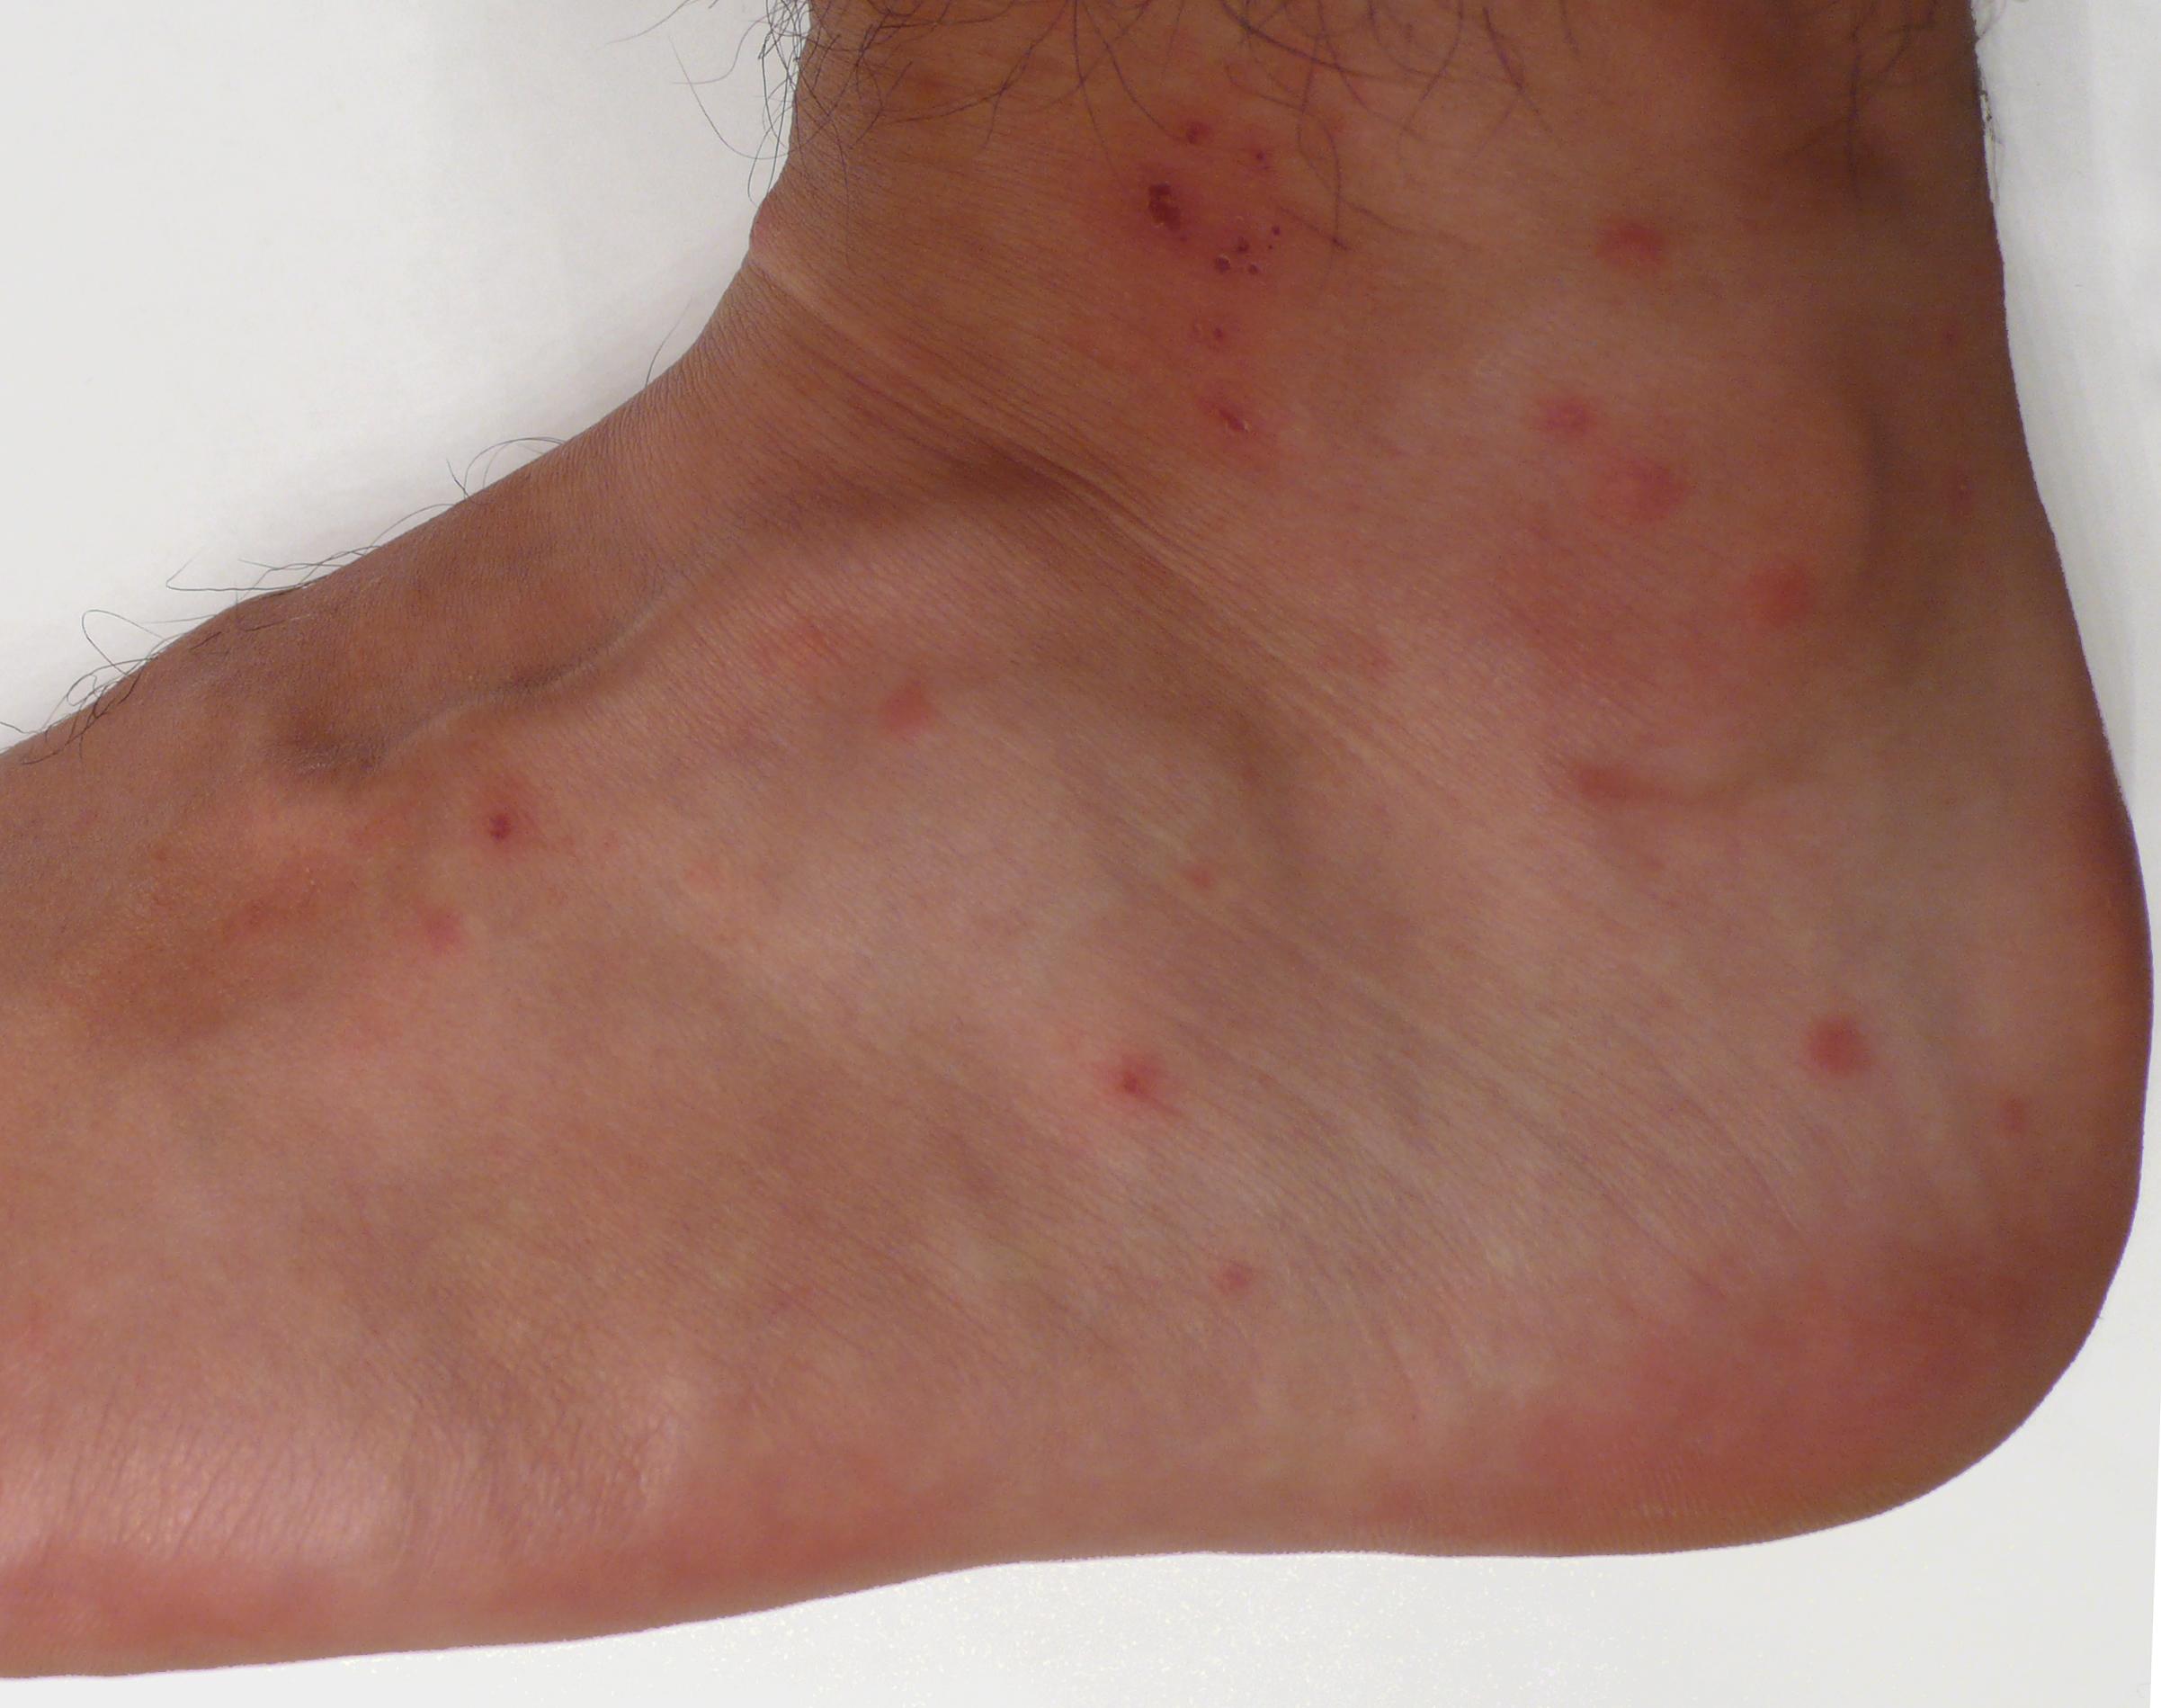 Treating Genital Herpes Outbreaks Naturally